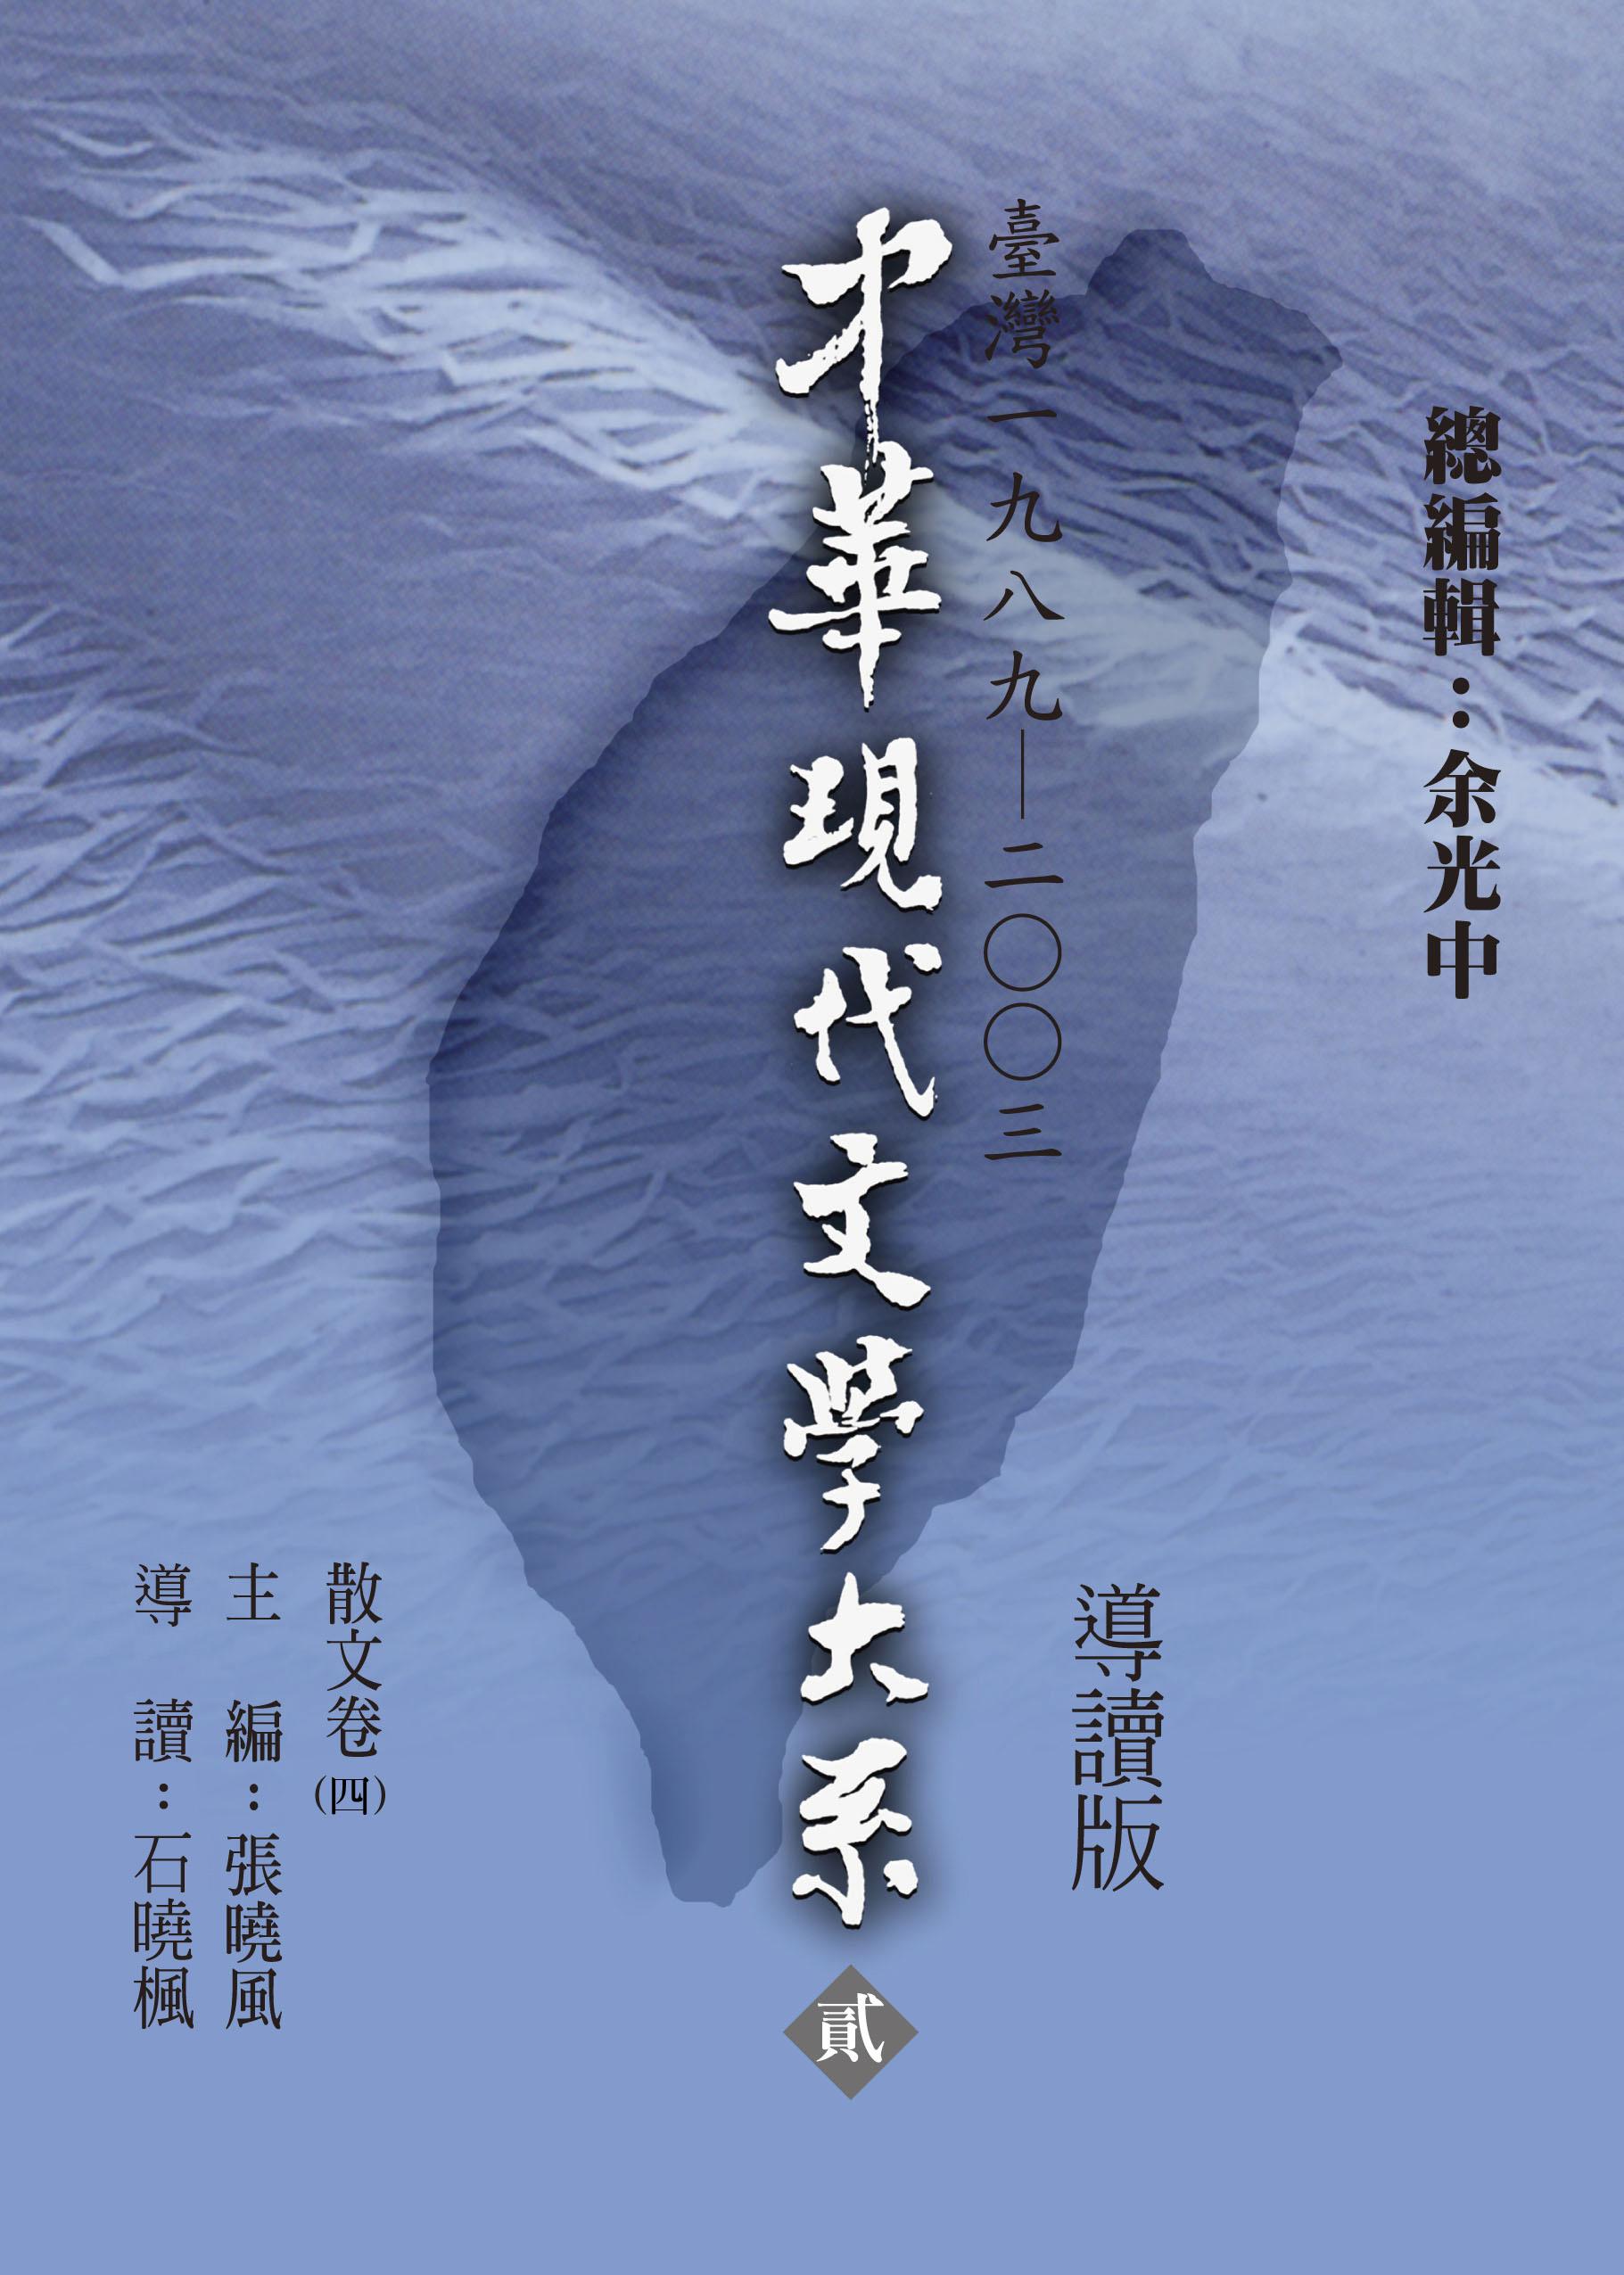 Kk026 中華現代文學大系二散文卷4